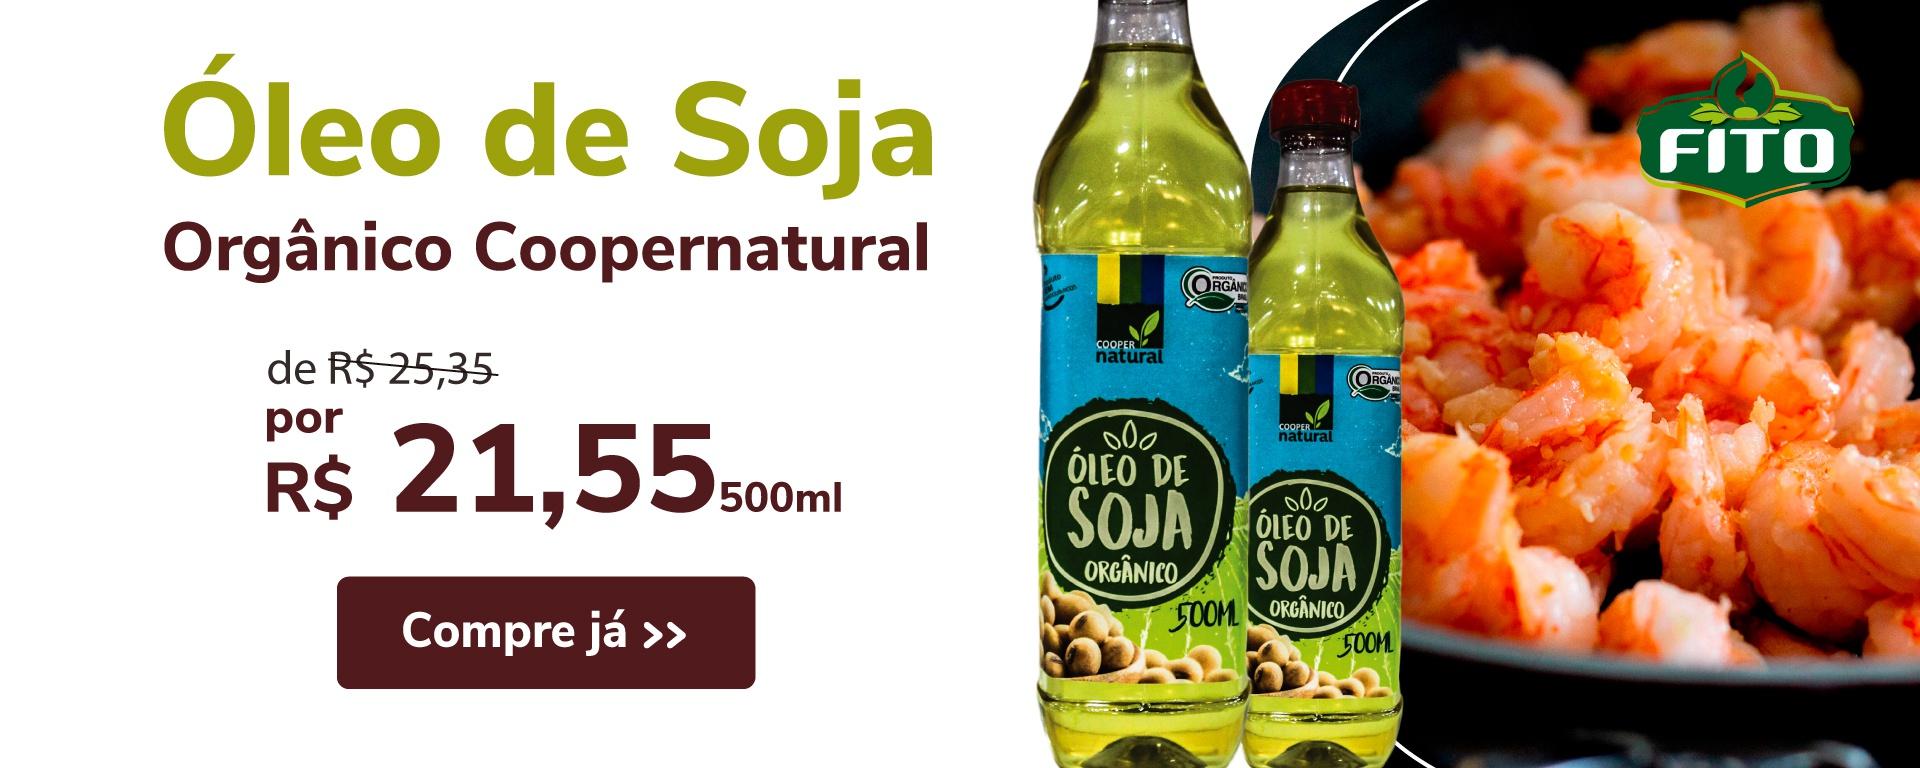 Oleo de Soja Mobile